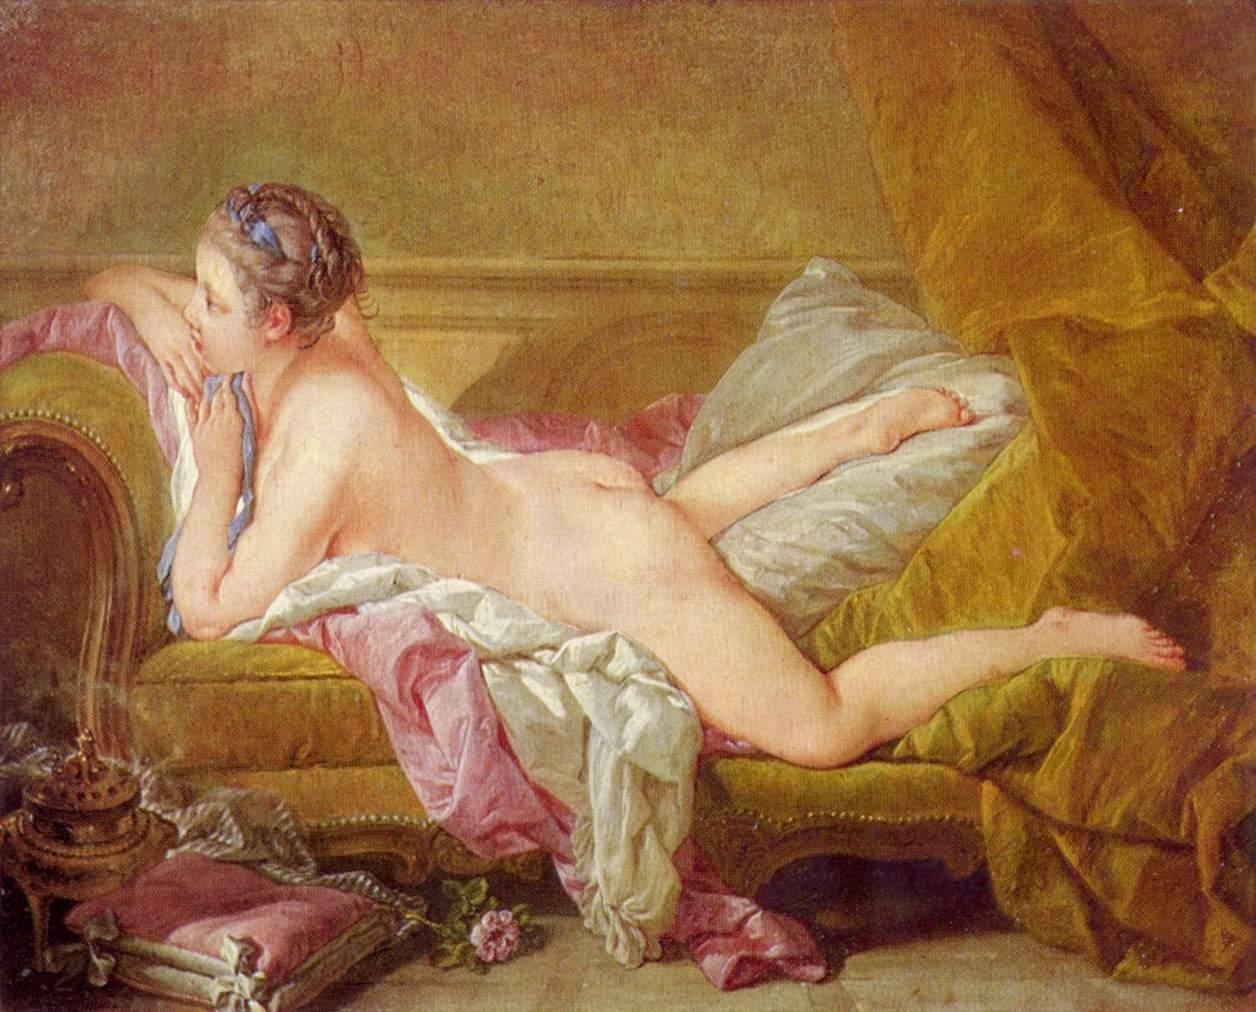 Donna murphy desnuda desnuda